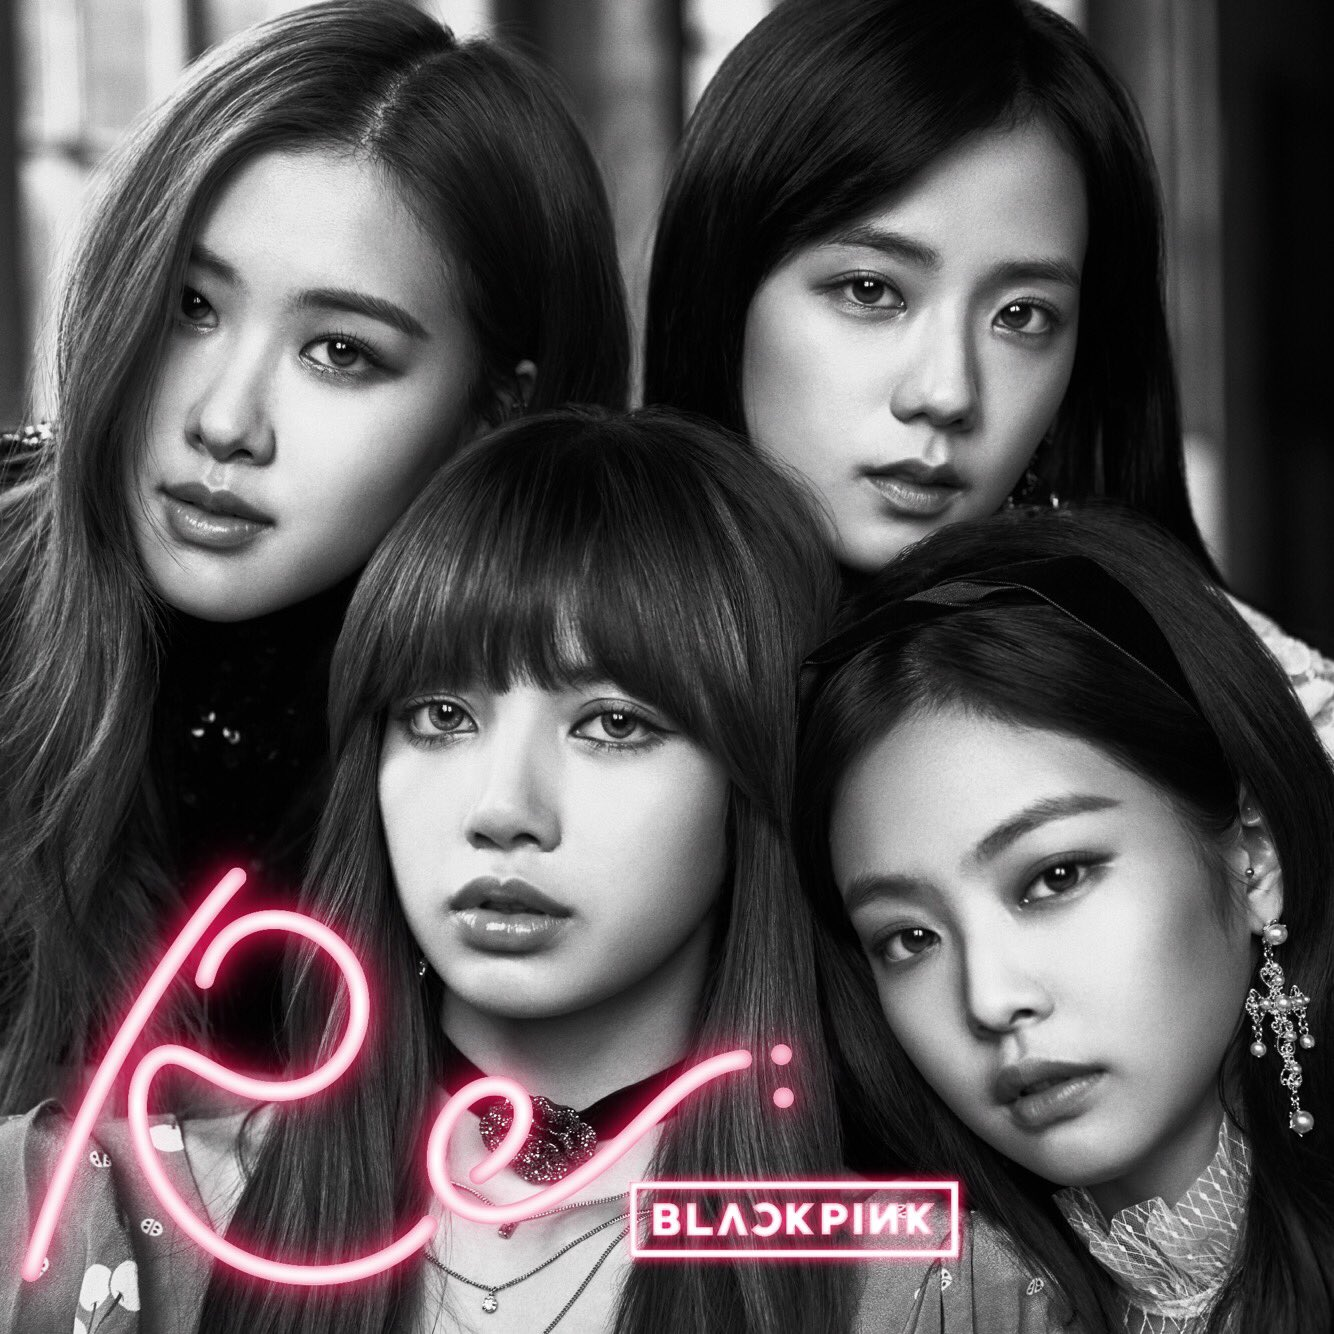 Blackpink repackage album cover